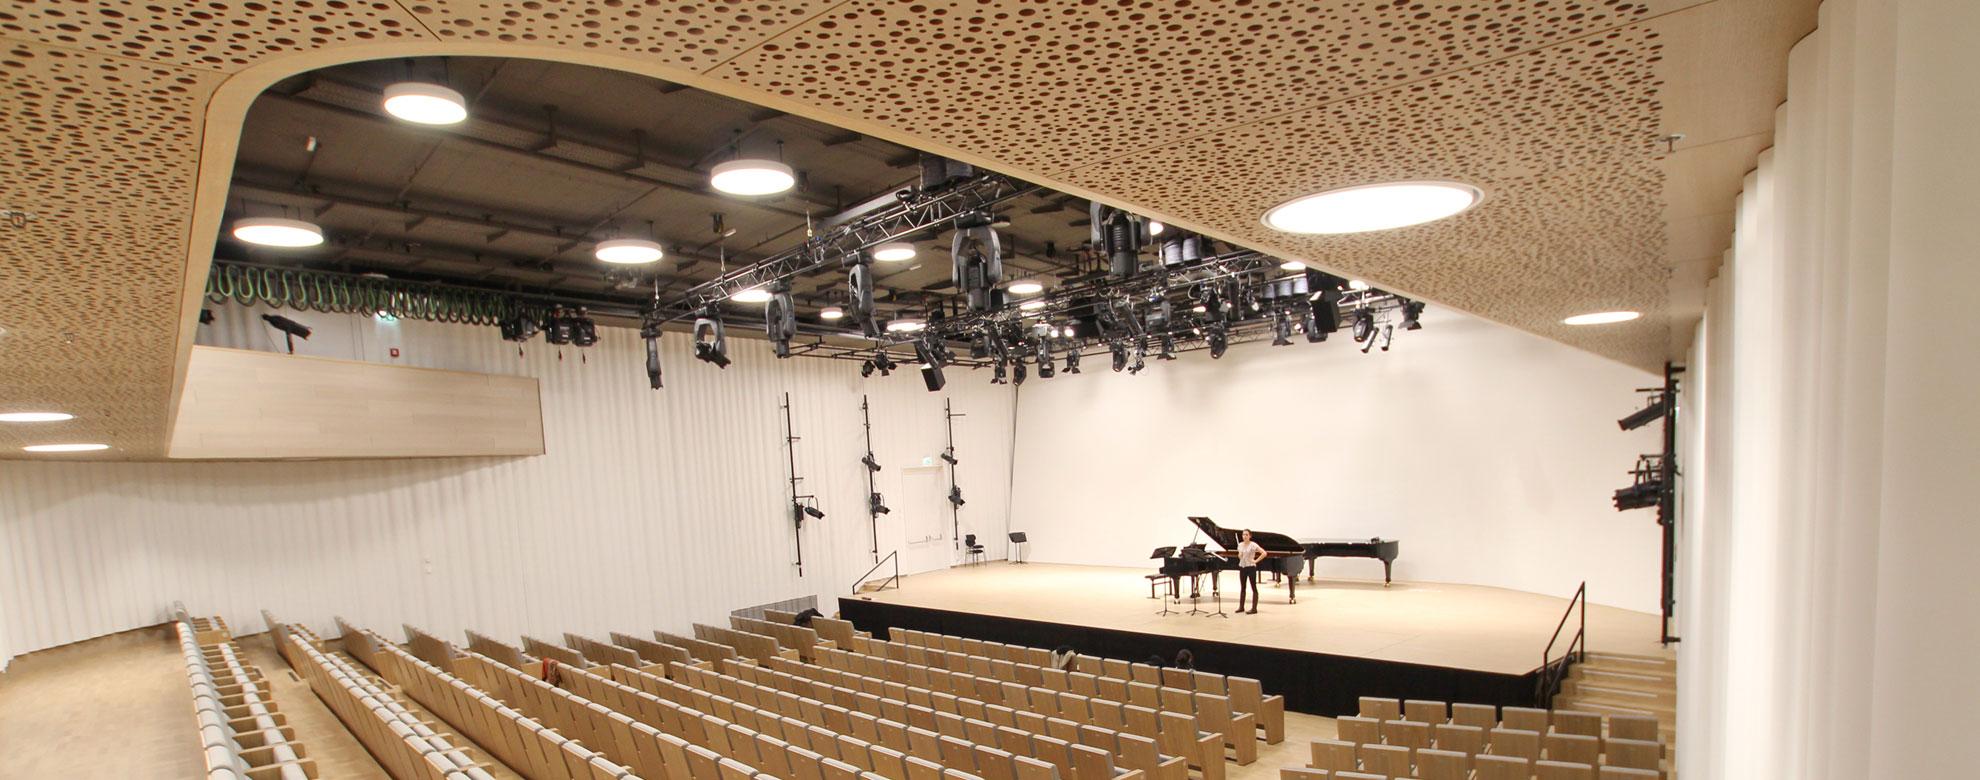 Veranstaltungssaal-Akustik